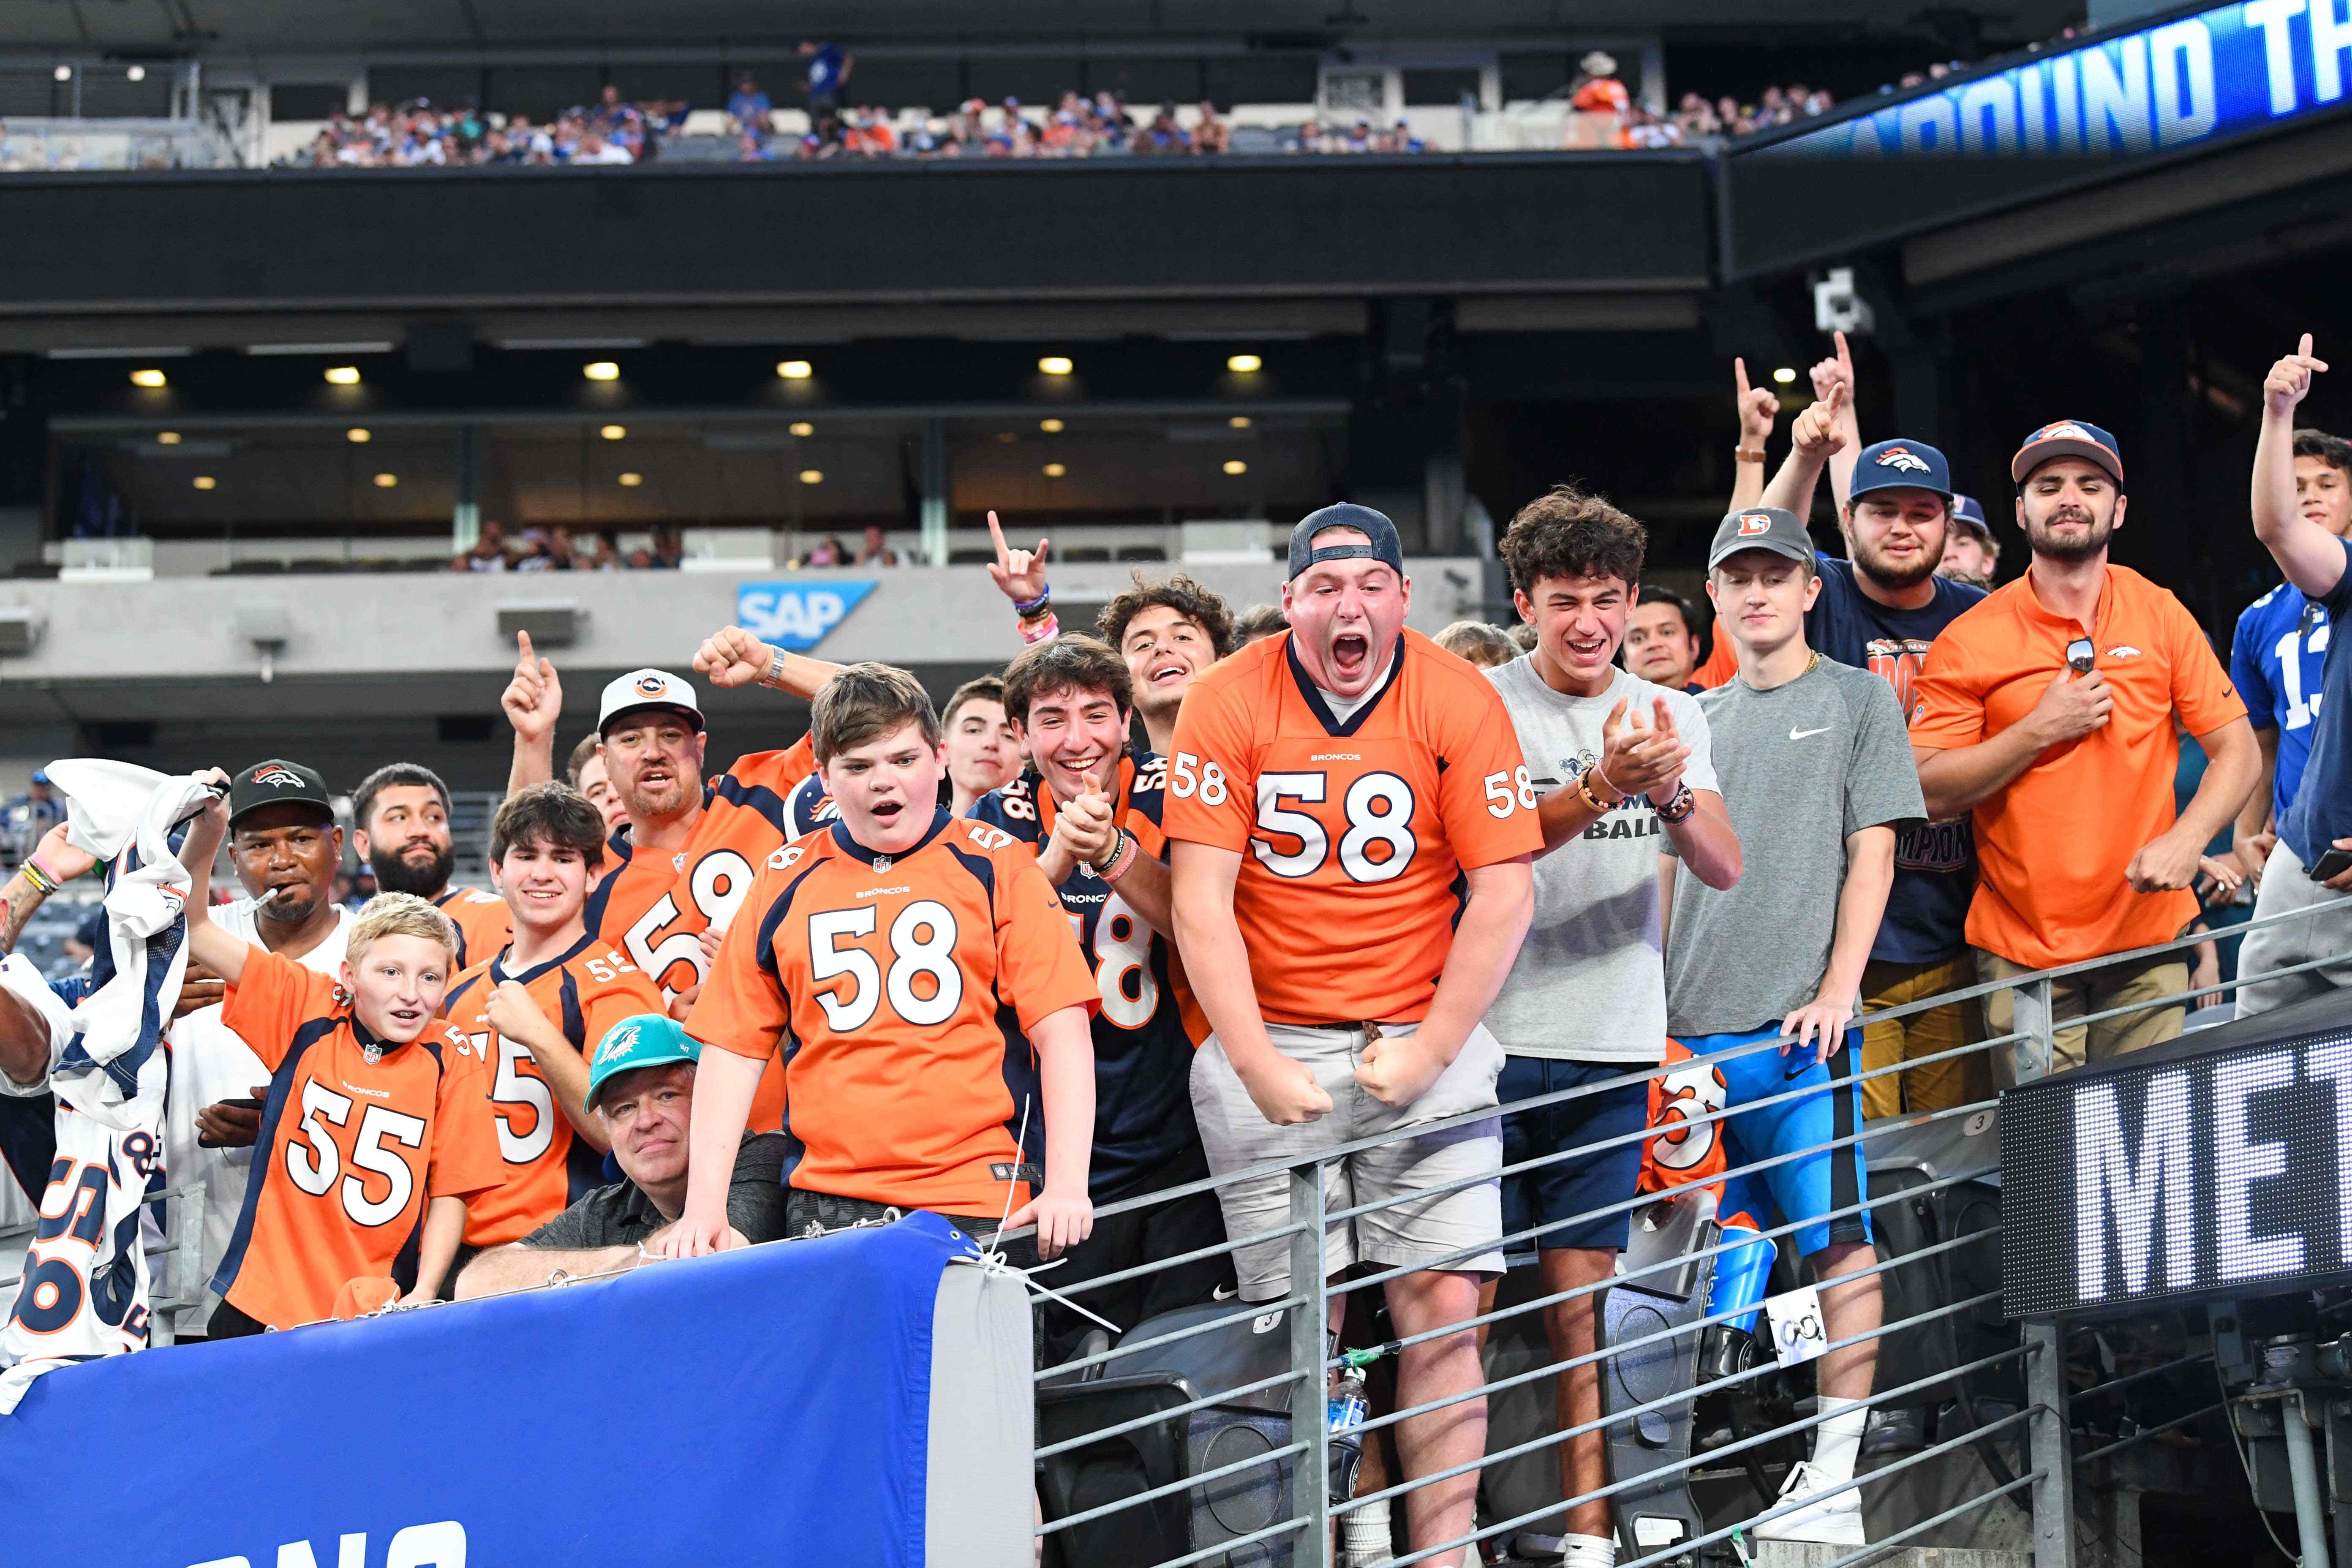 Broncos players loved seeing 'sea of orange jerseys' at Giants' stadium